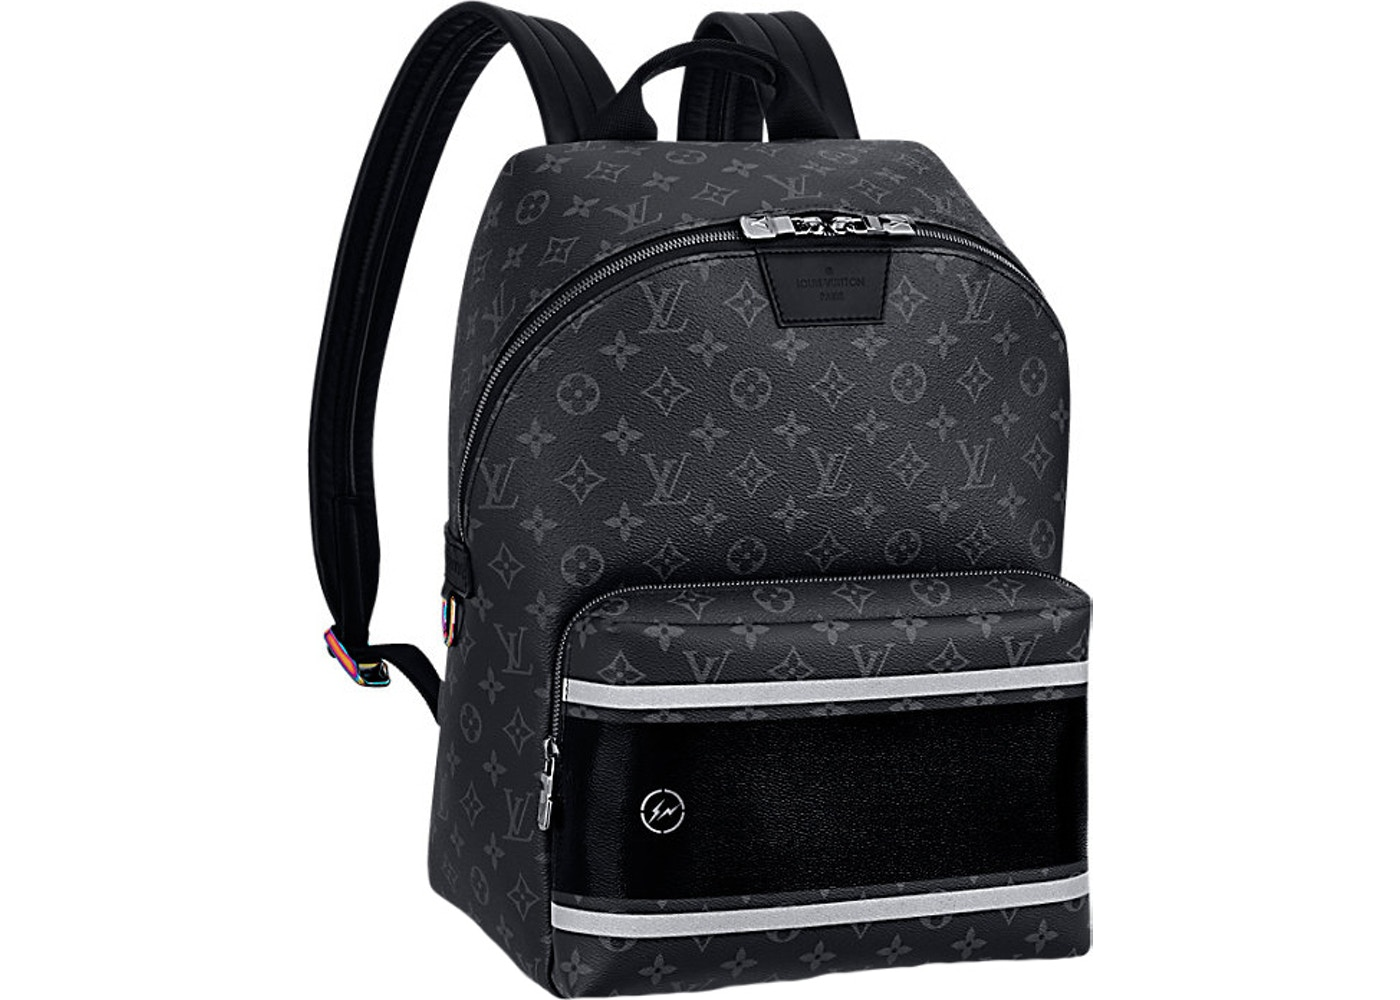 37883961b503 Louis Vuitton x fragment Apollo Backpack Monogram Eclipse Black. Monogram  Eclipse Black